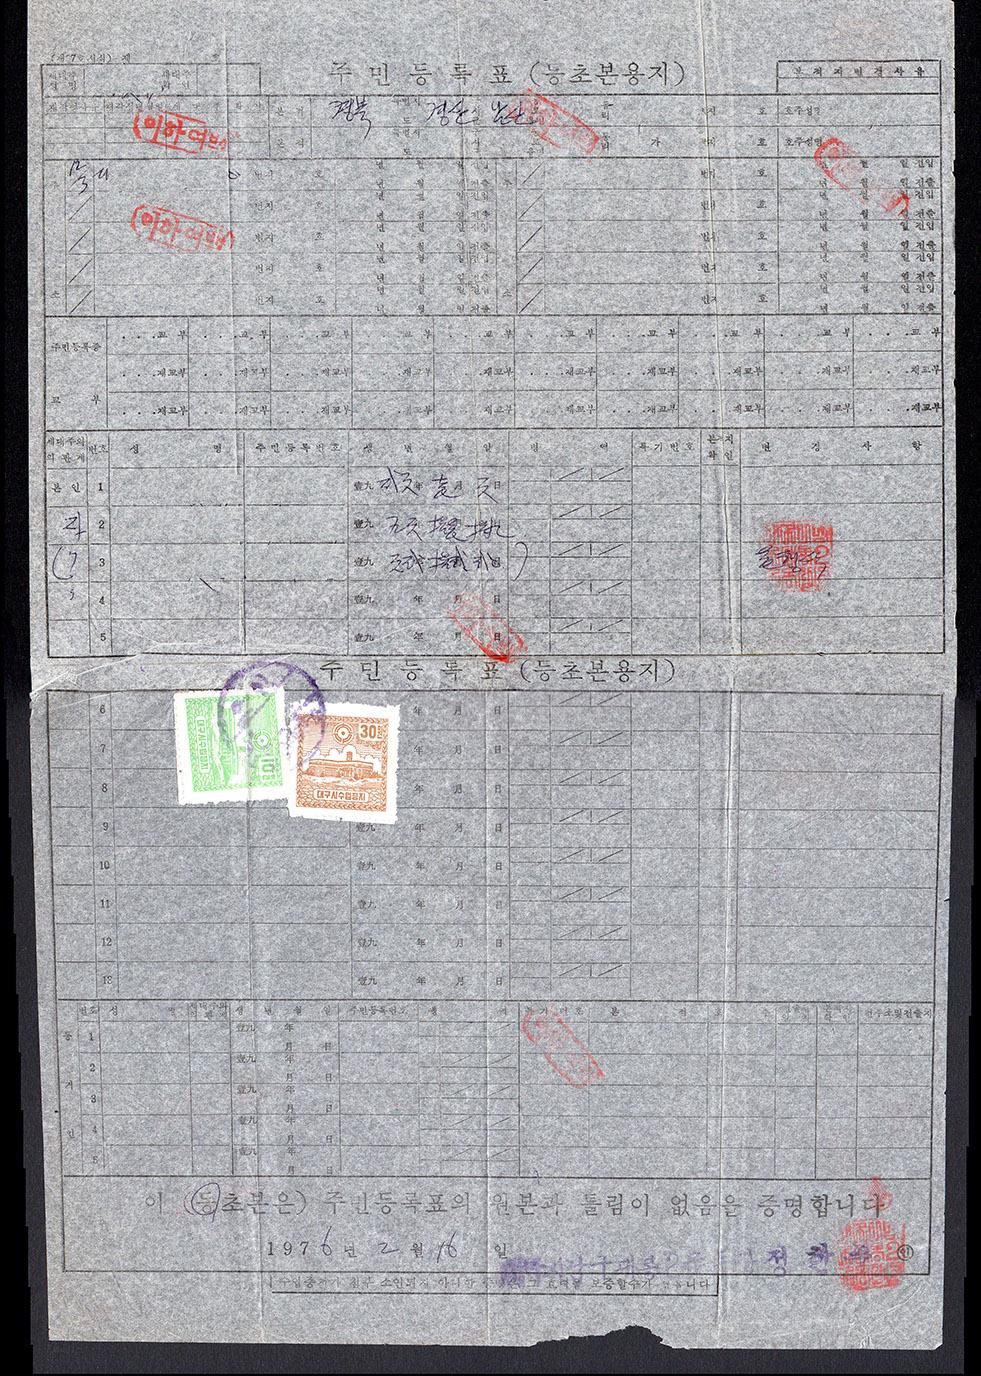 Daegu_resident_registration_1976_981px